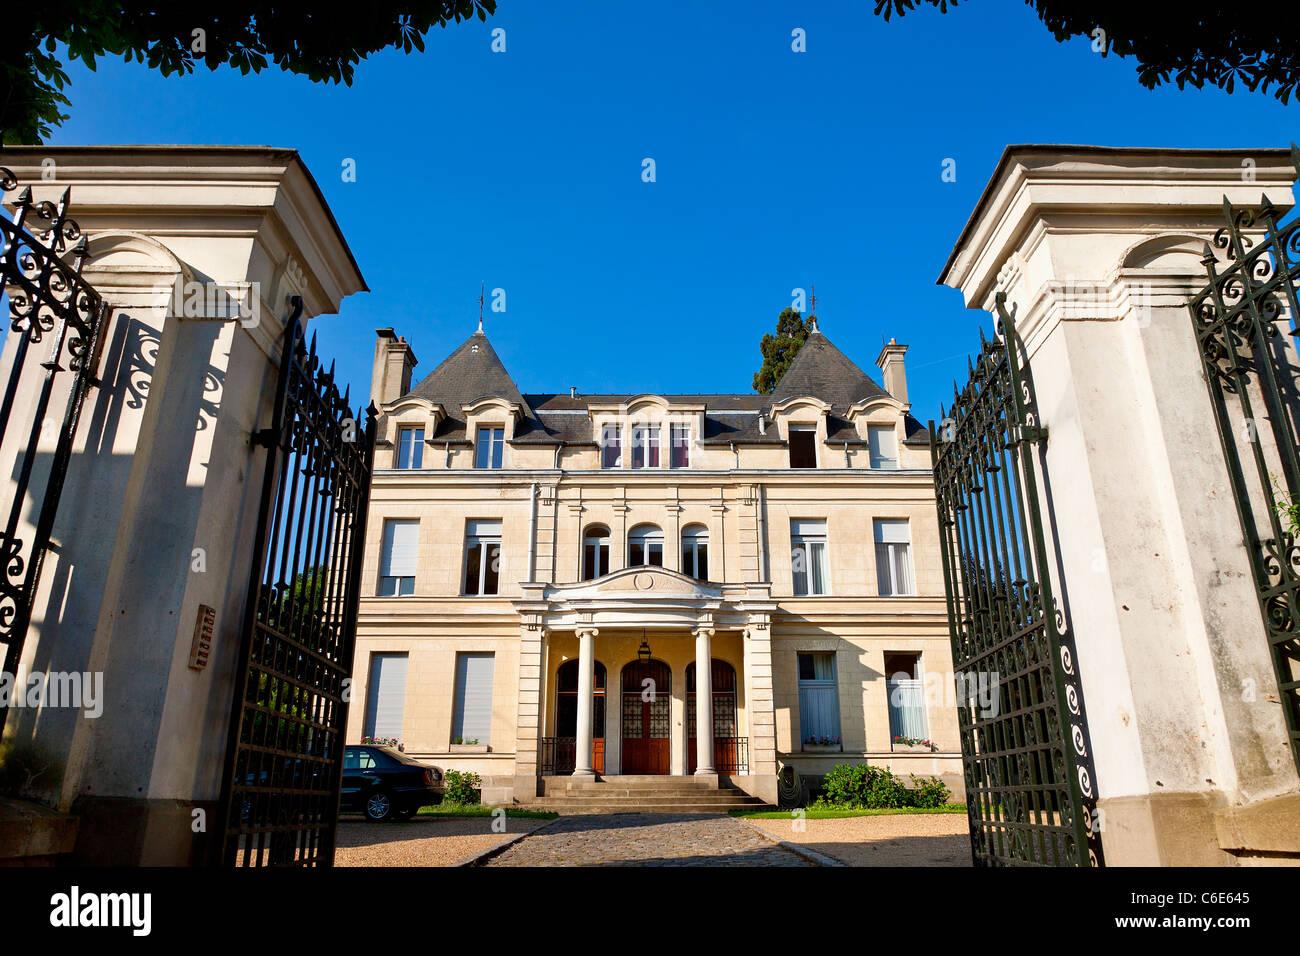 Europe, France, Yvelines (78), Rambouillet Dwelling - Stock Image